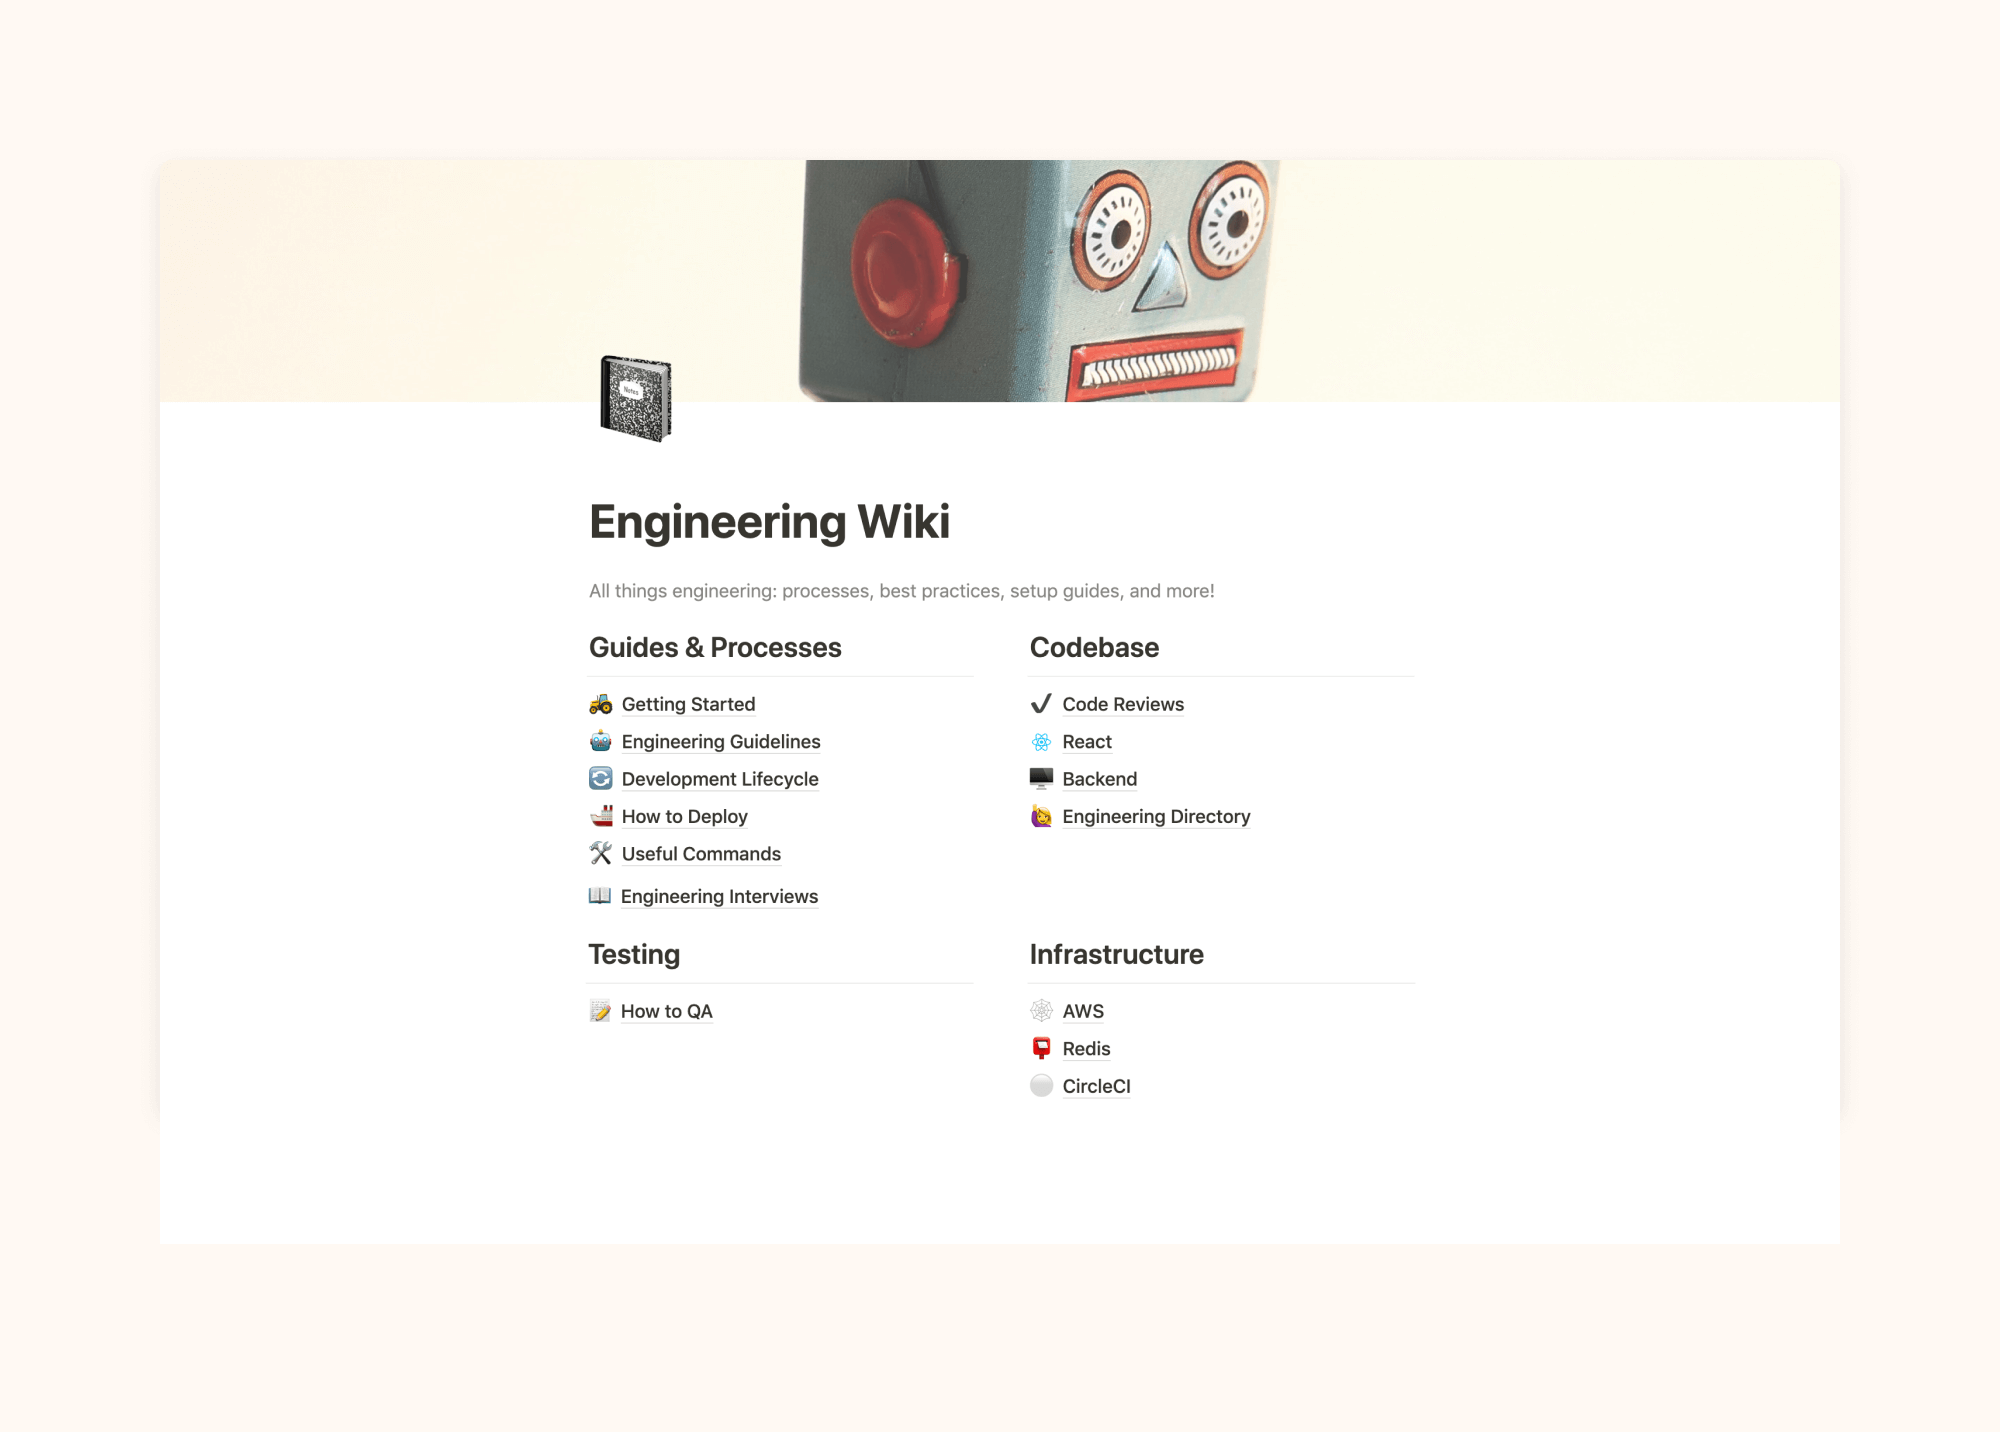 Engineering wiki